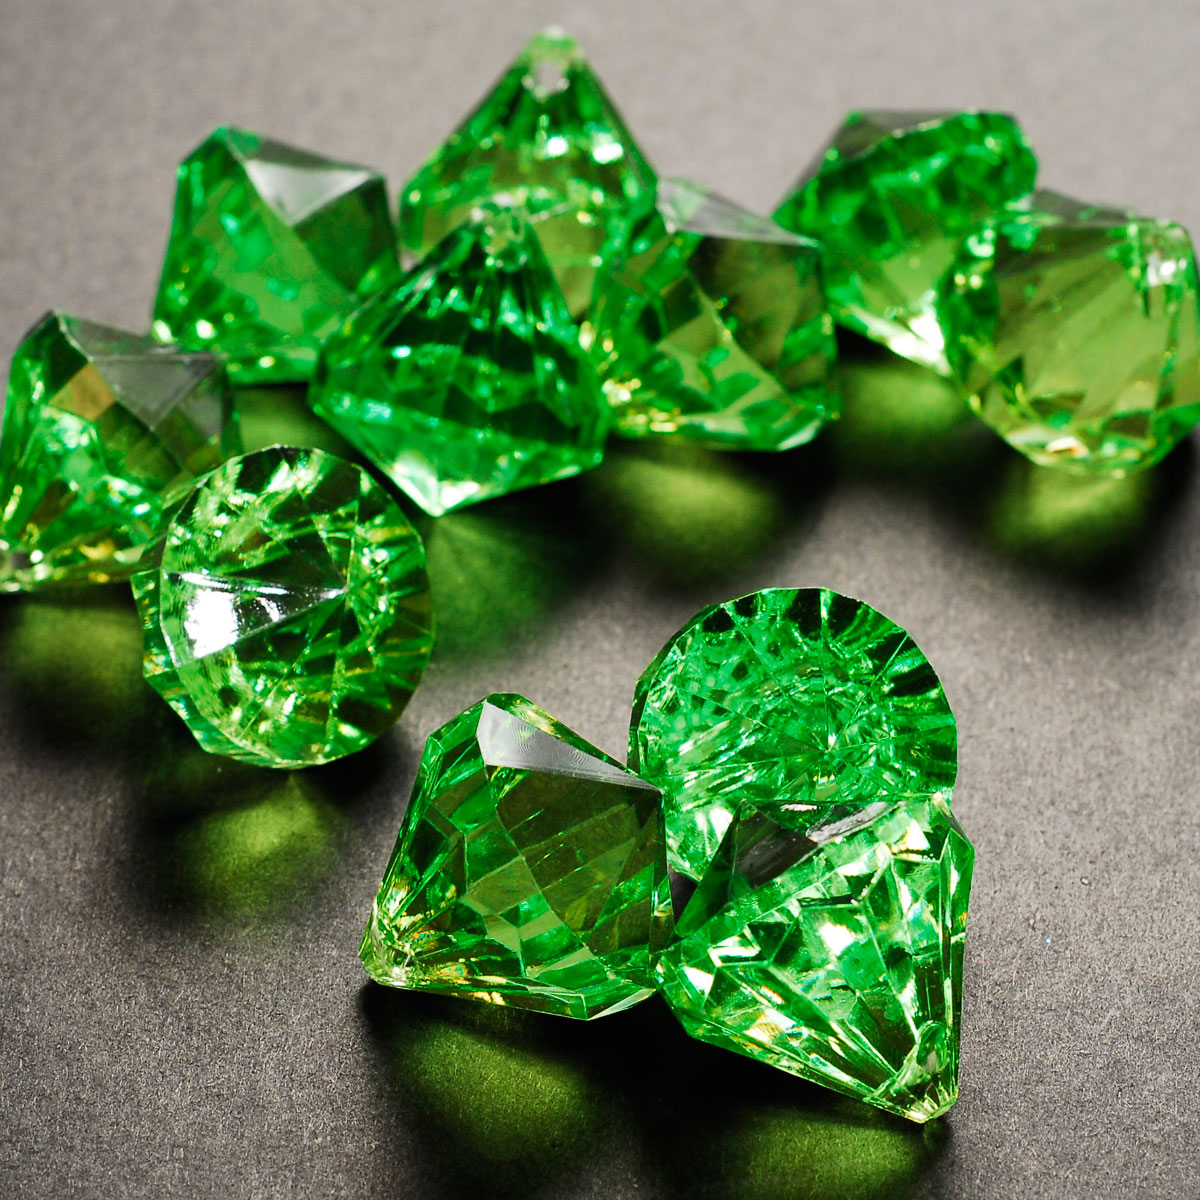 Assorted Pirate Gems large Acrylic Diamond table scatter vase filler pendant  eBay